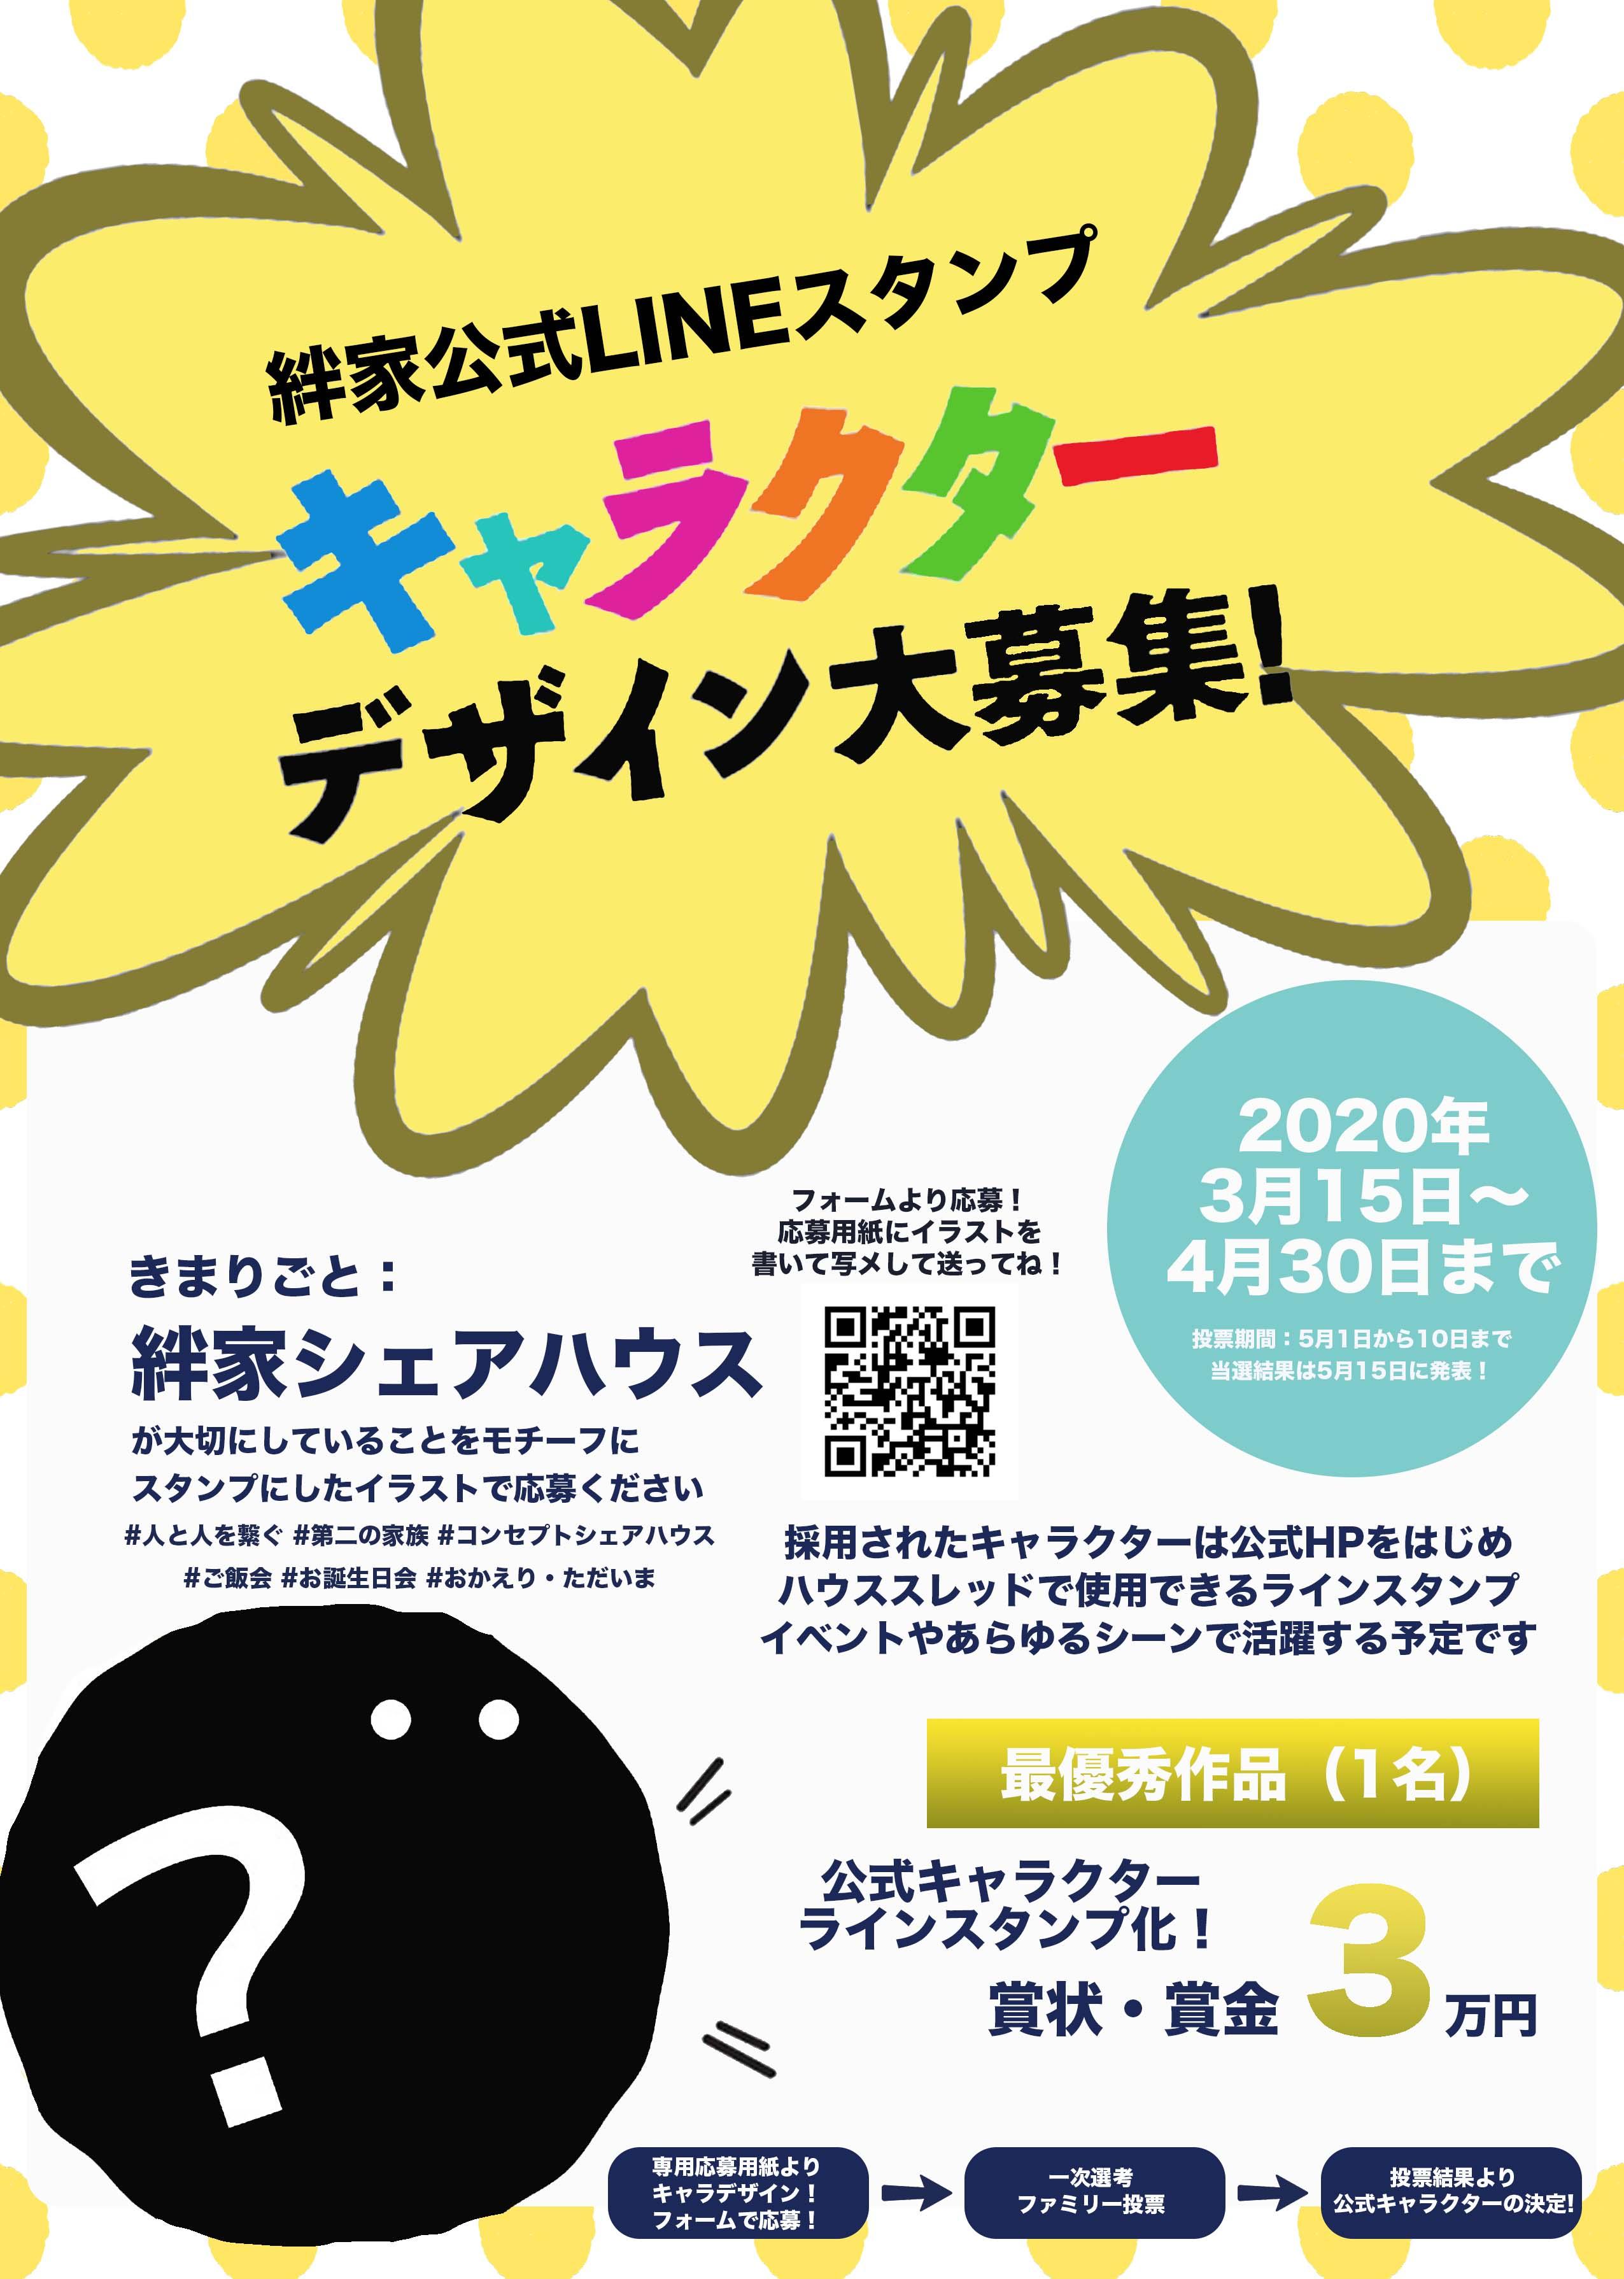 (JP) \絆家公式ラインスタンプキャラクター大募集!/当選者は賞金3万円!